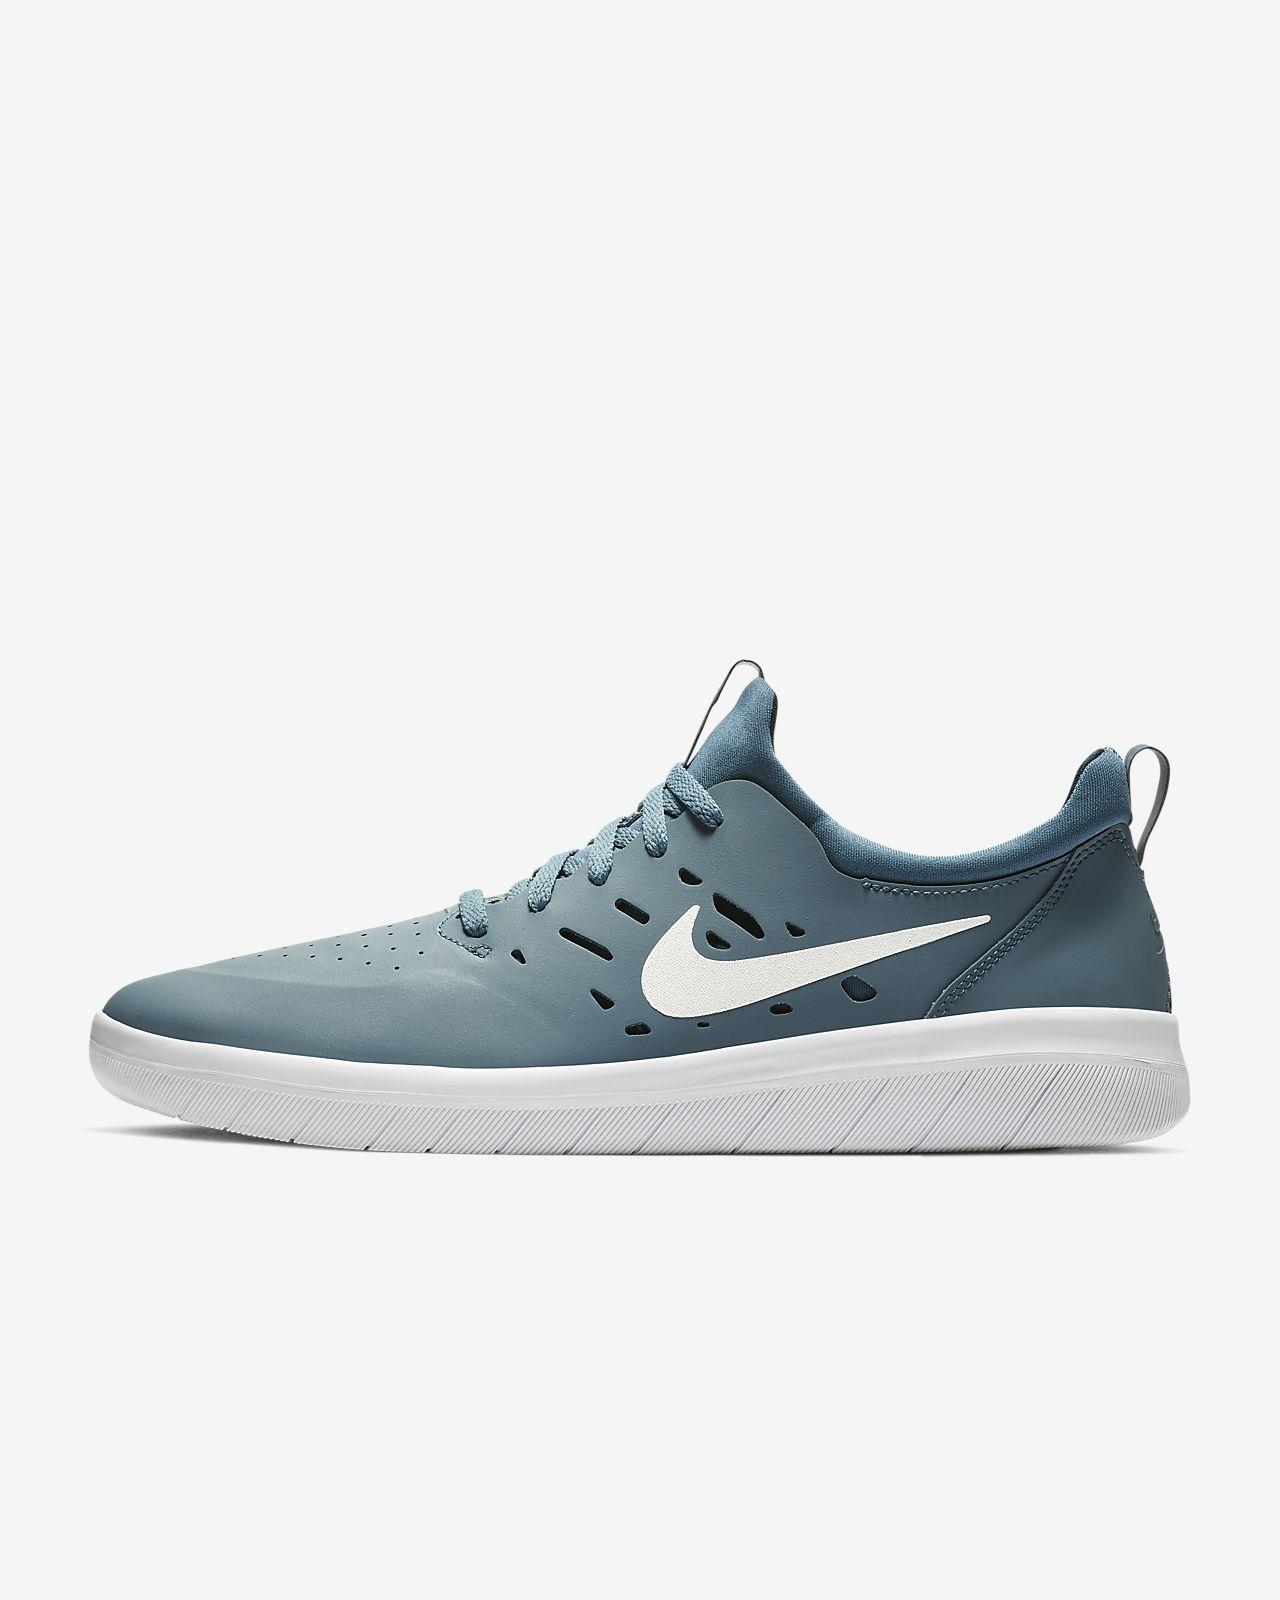 Nike Nyjah Nike SB SB Free Skateboardschuh Nyjah LqUMVjSzpG